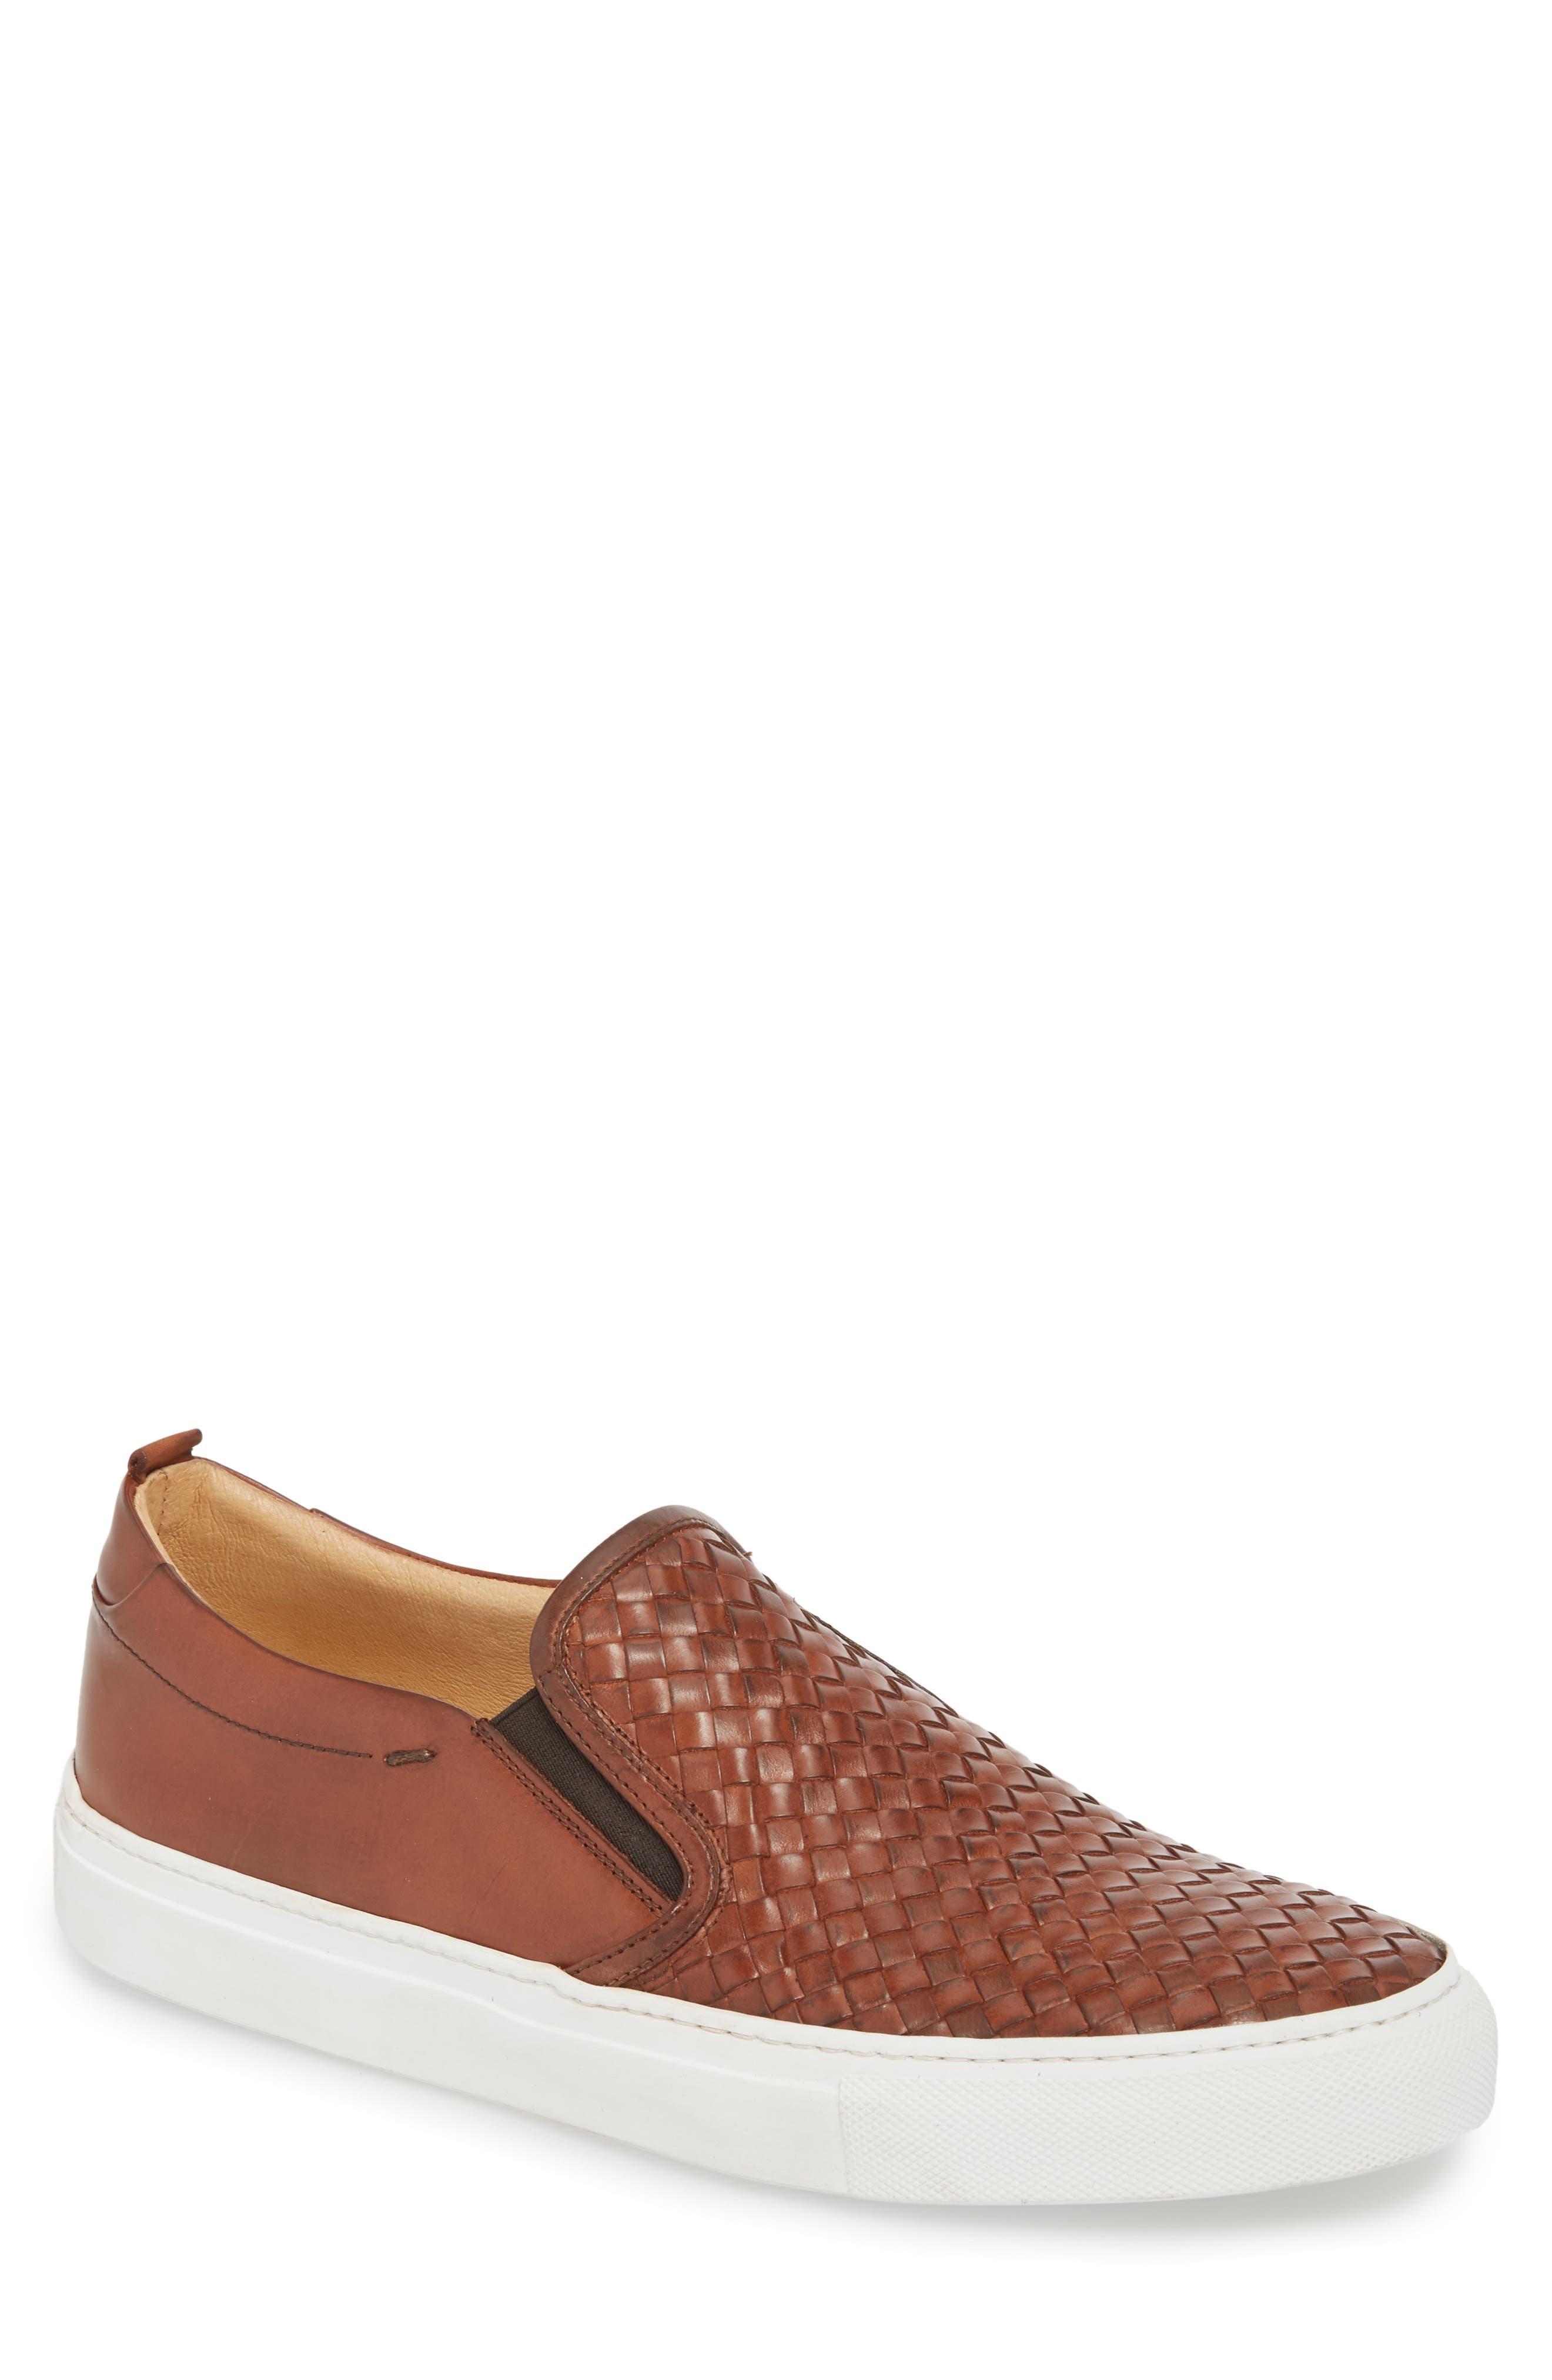 Kenneth Cole New York Grifyn Woven Slip-On Sneaker (Men)